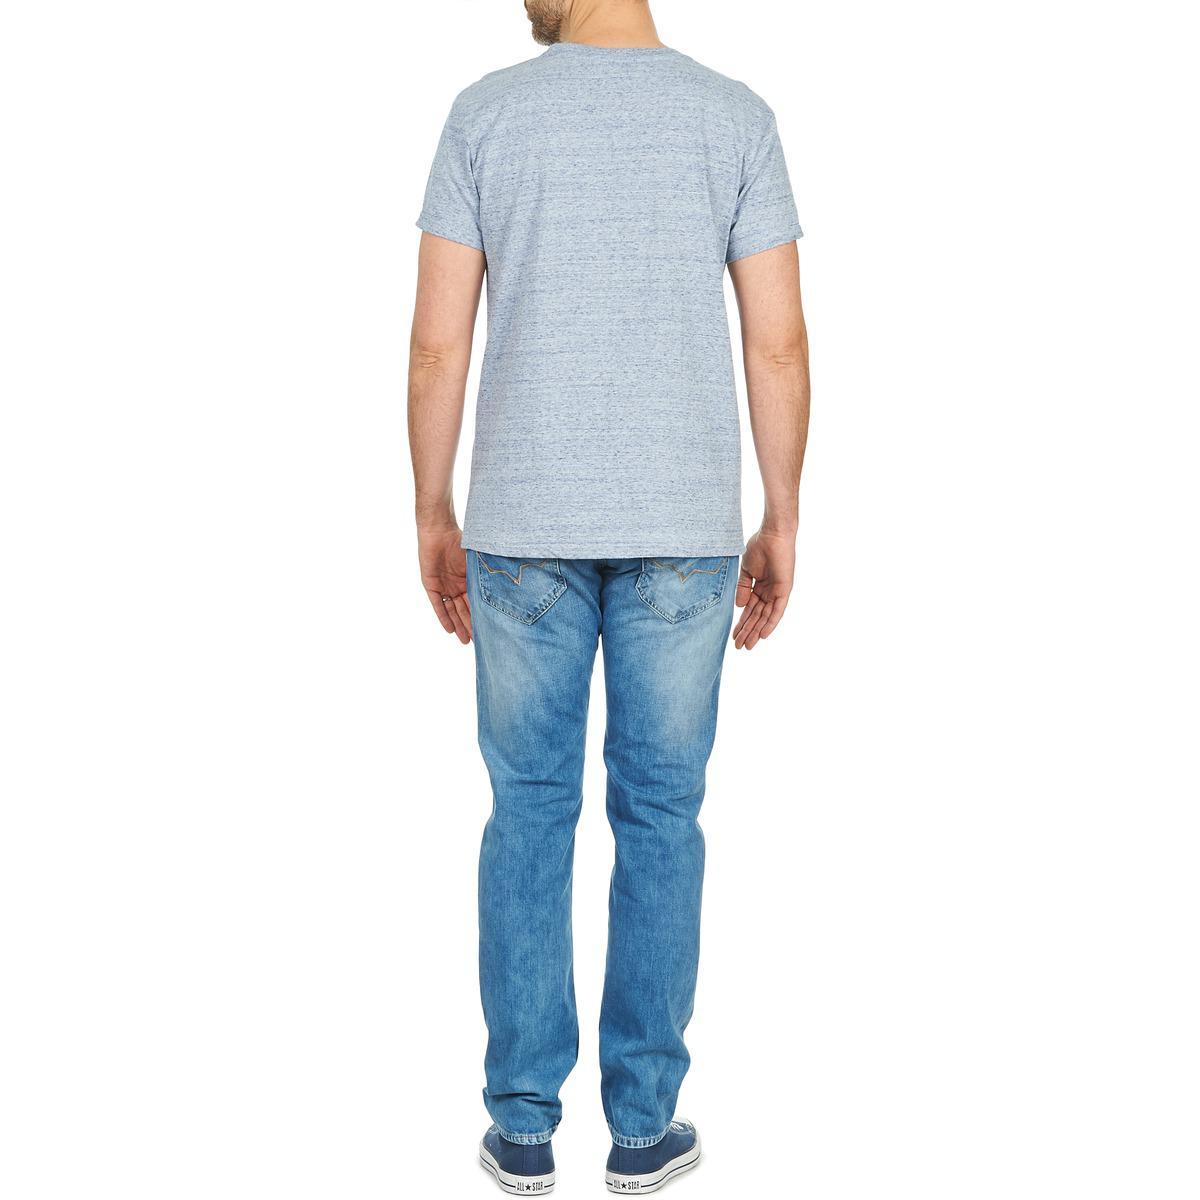 Pepe Jeans Denim Lyle Men's Jeans In Blue for Men